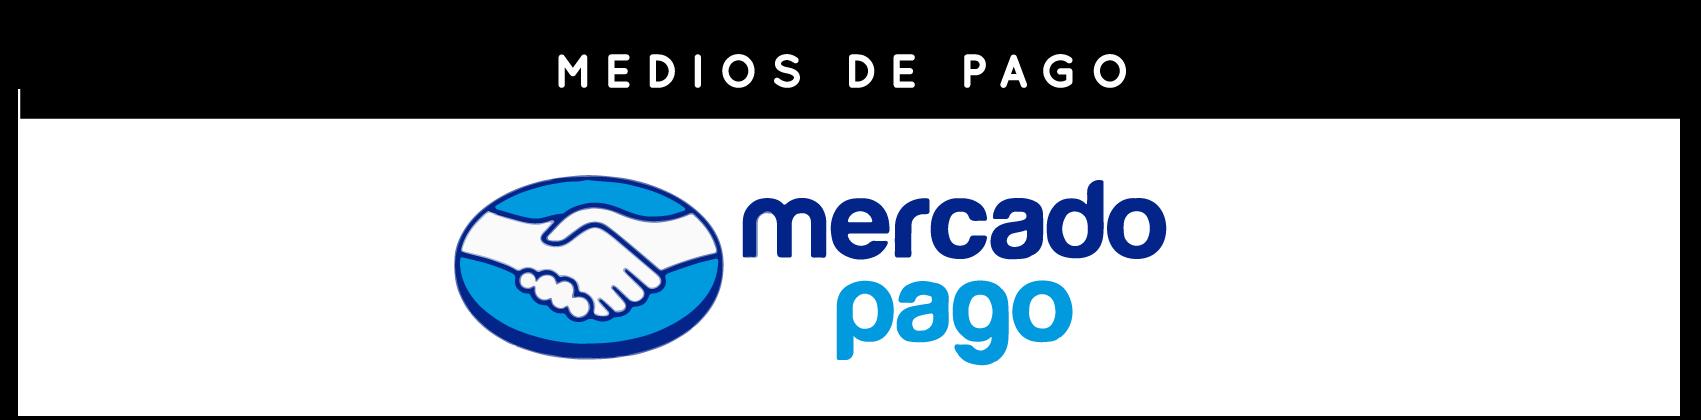 BANNERS_medios de pago.png